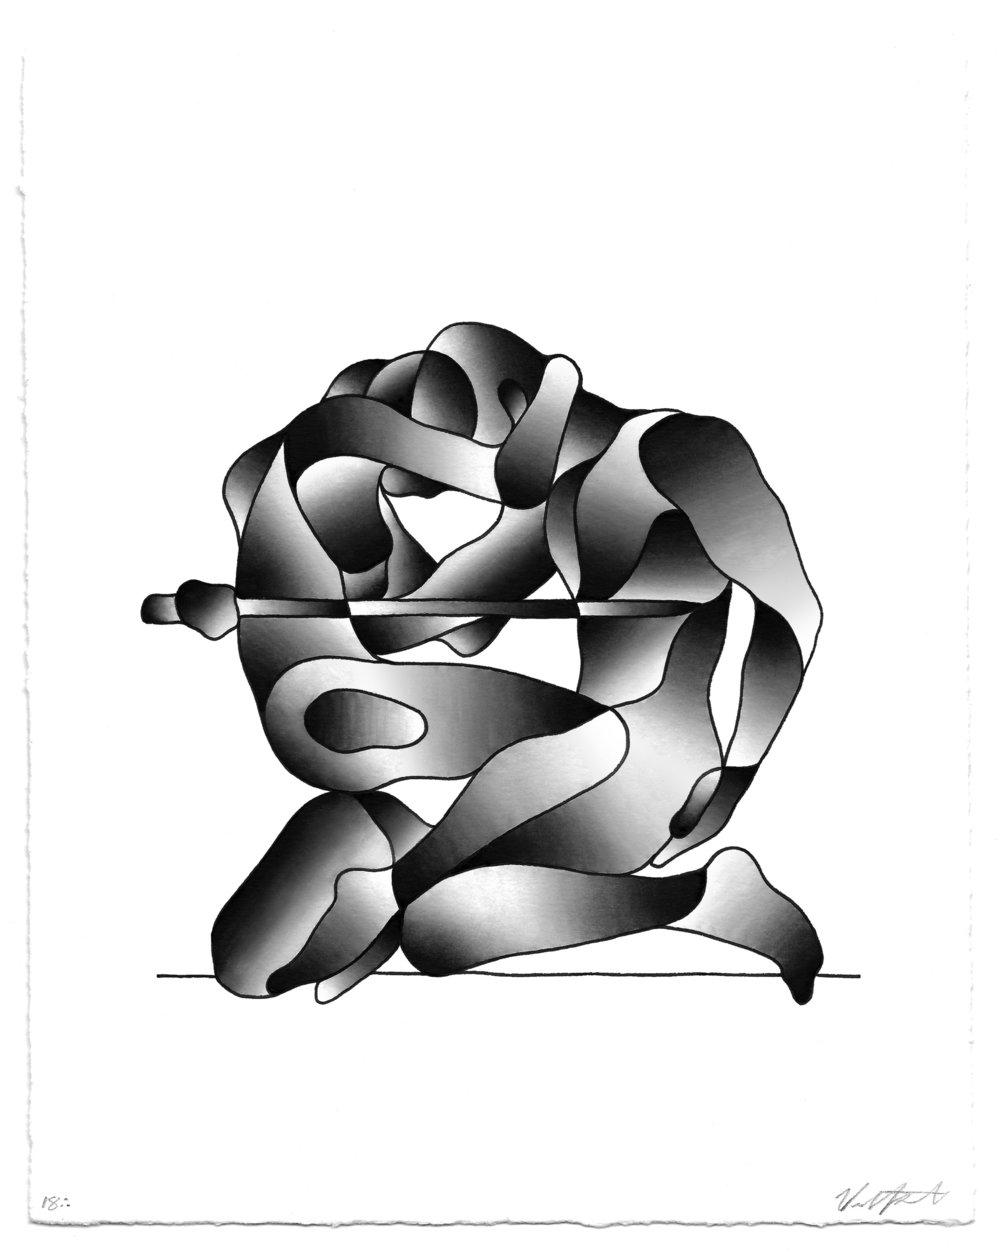 Figure_59.jpg